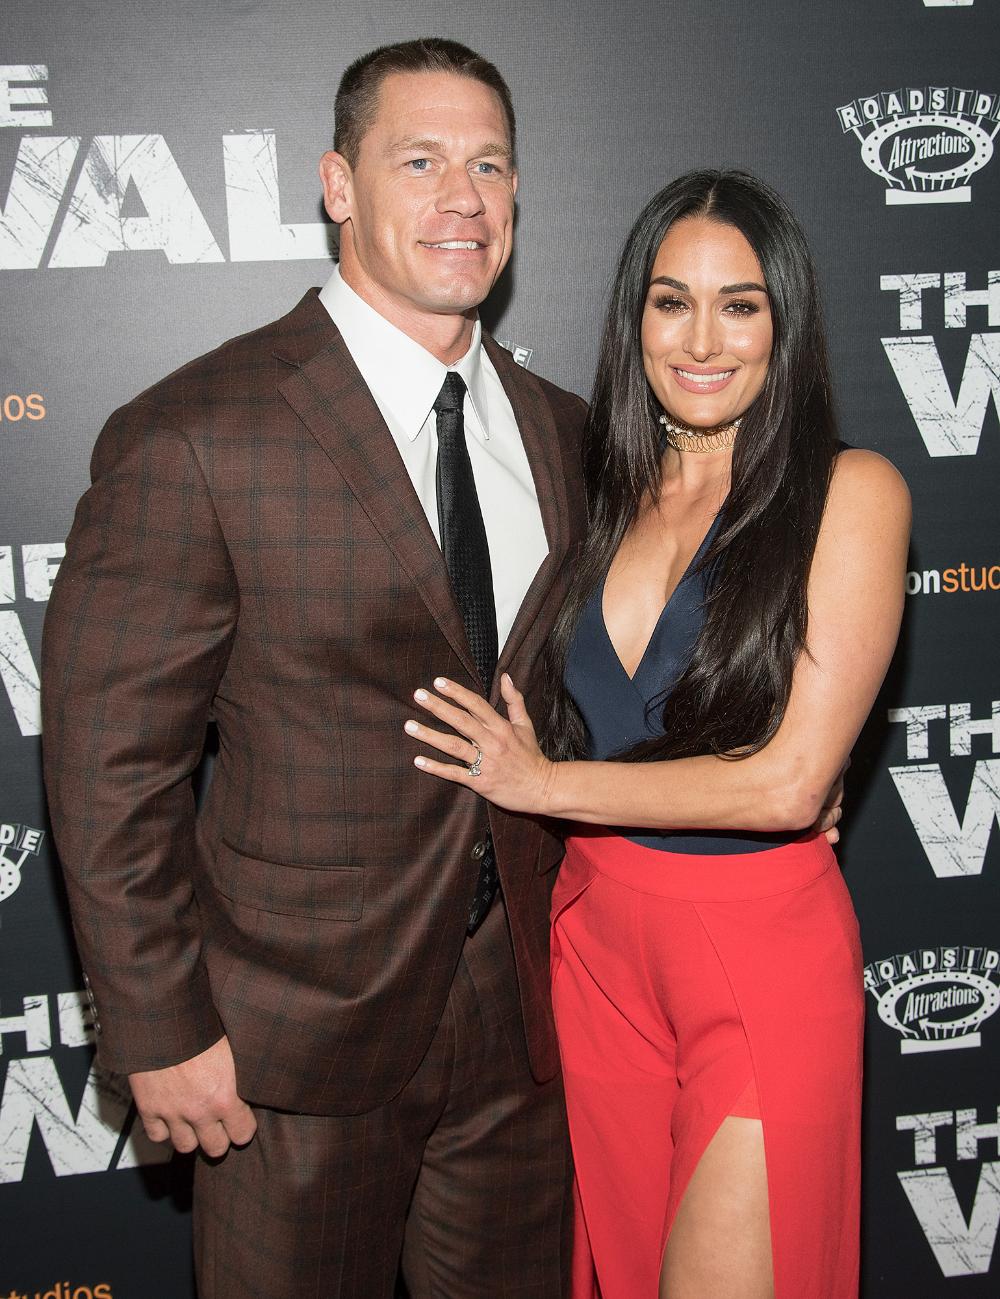 John Cena Net Net Worth Is Staggering John Cena Salary Net Worth Earnings The World News Daily Nikki Bella John Cena John Cena Nikki Bella